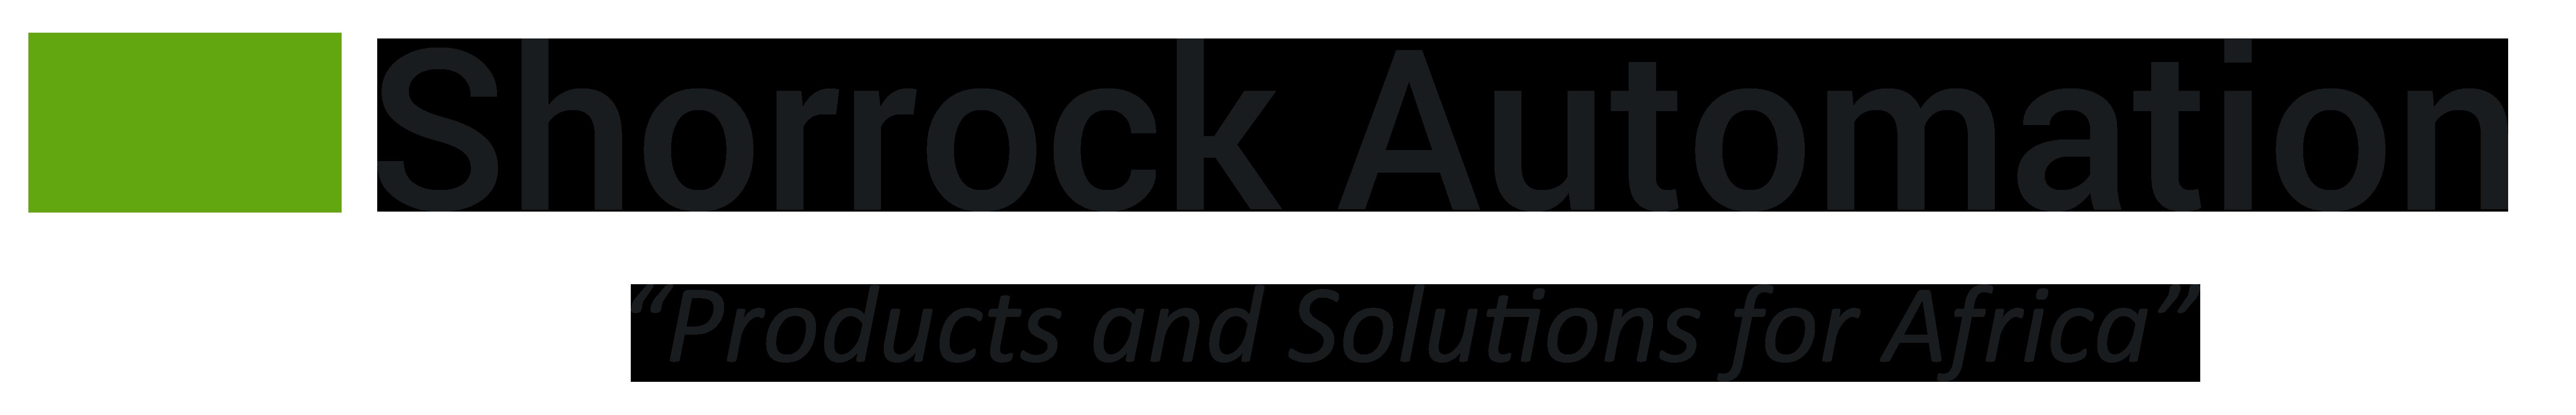 Shorrock logo